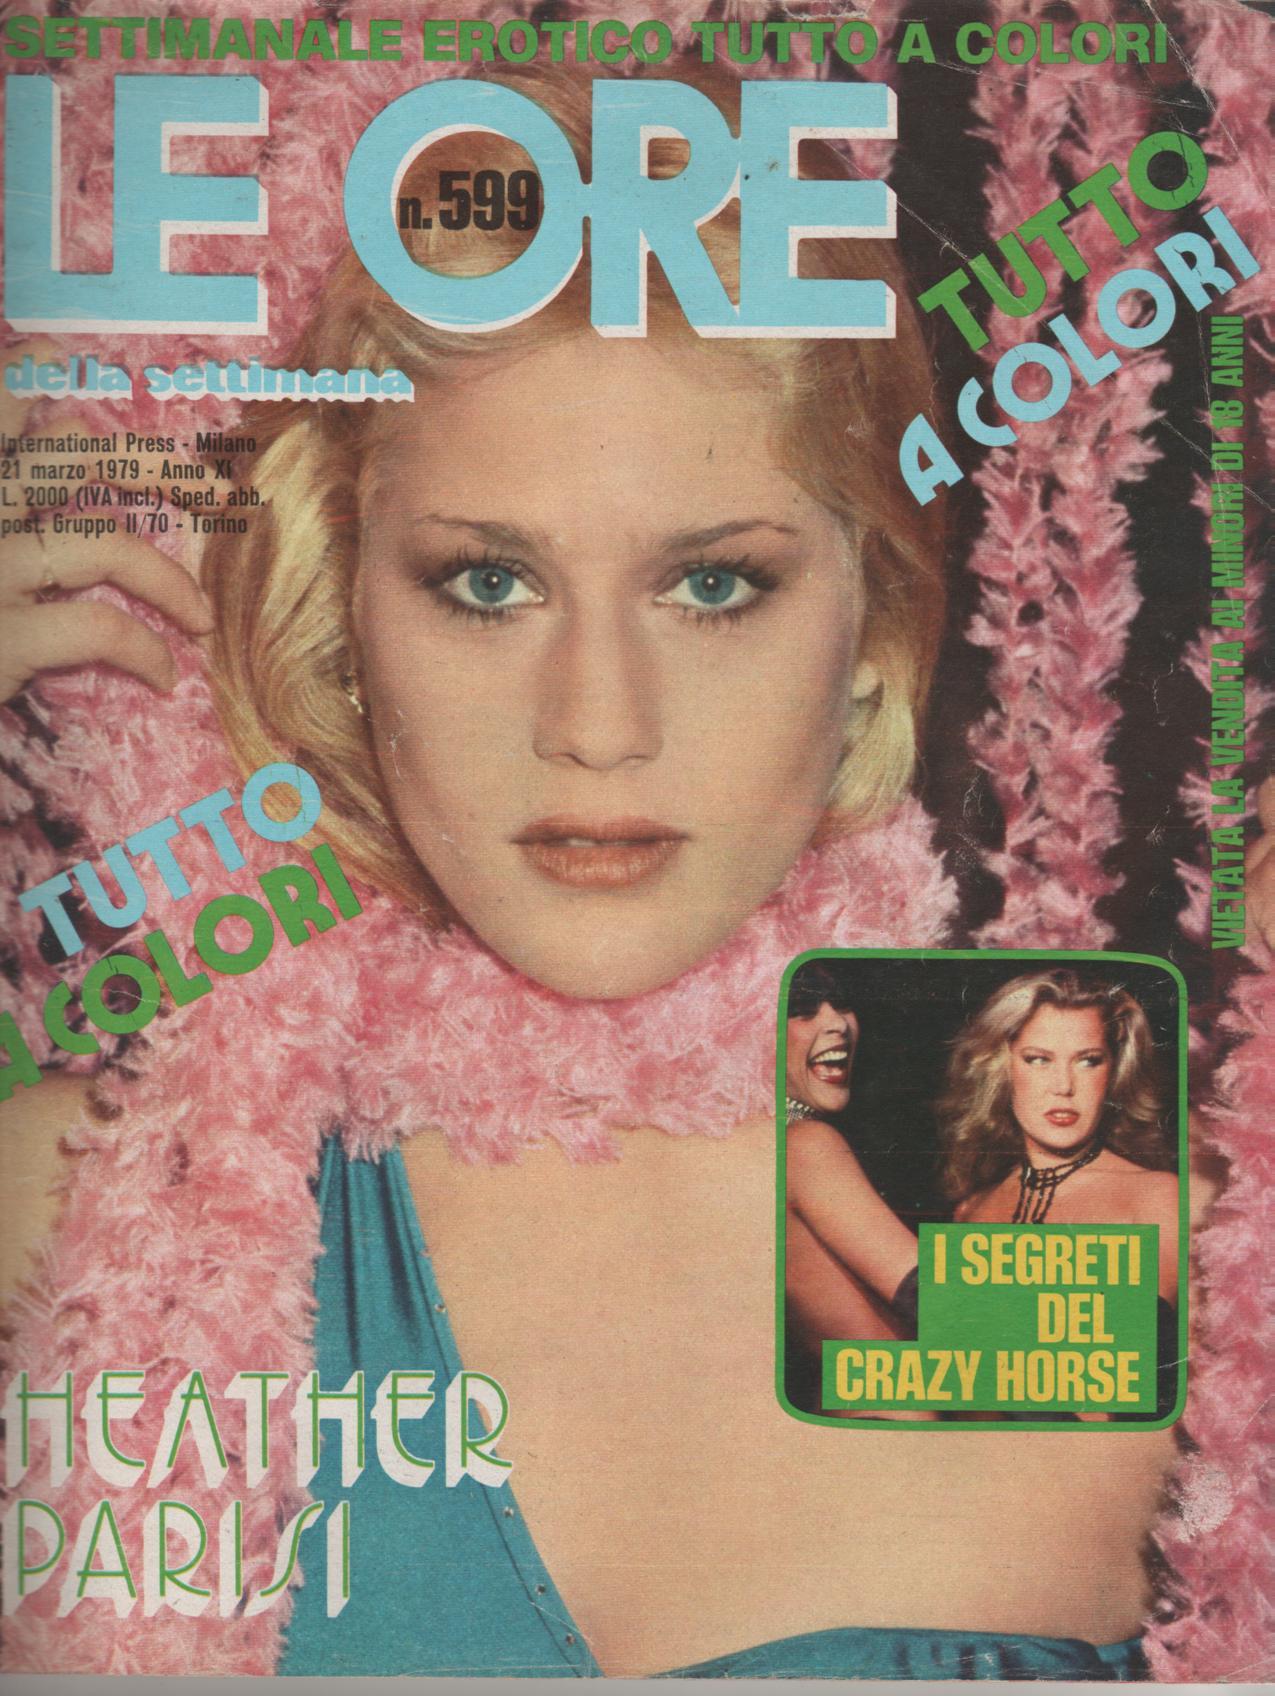 LE ORE  # 599 / 1979  HEATHER PARISI  softcore